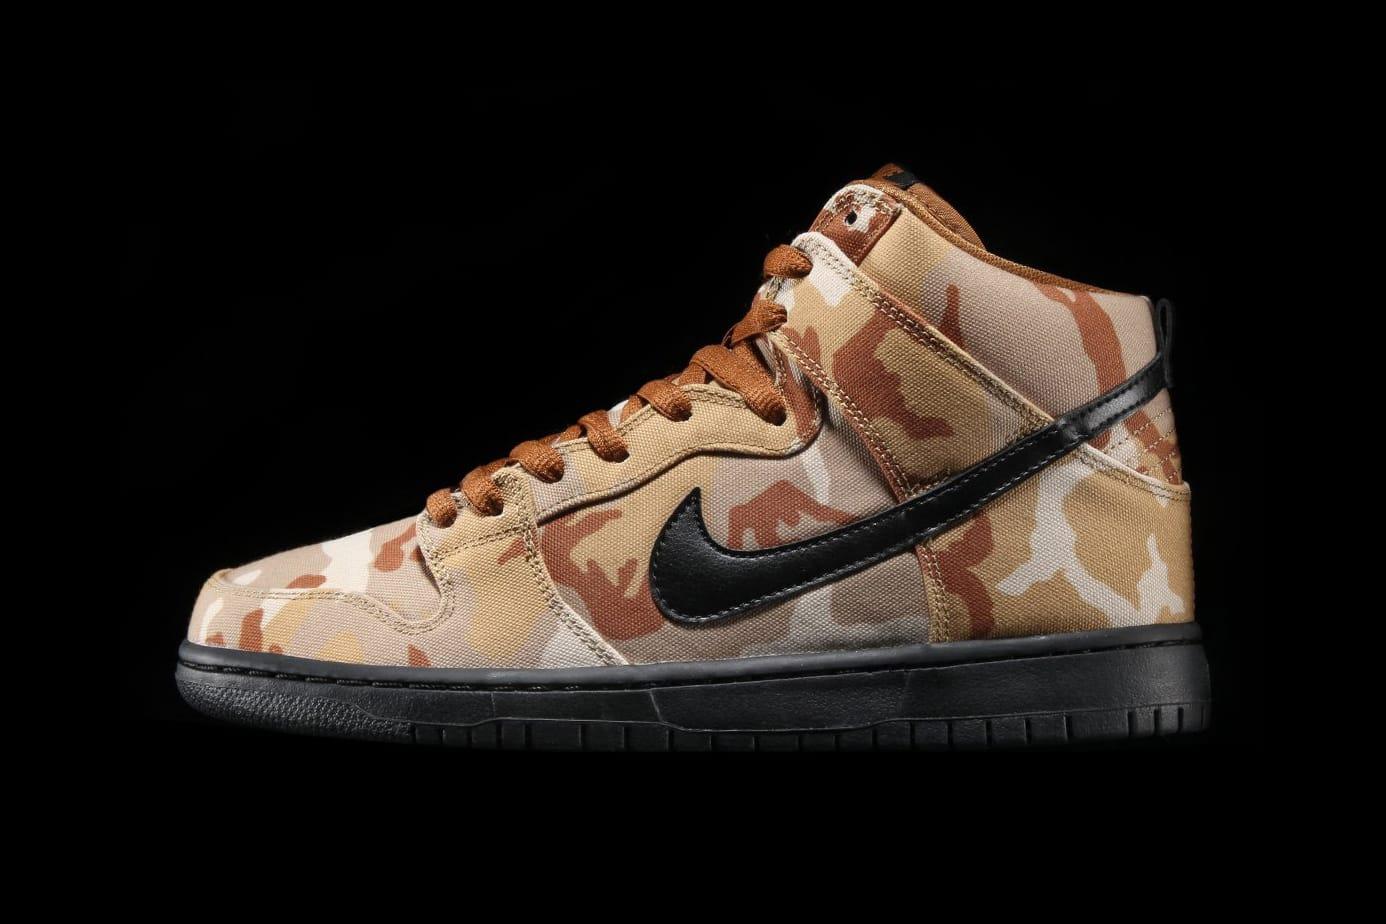 Nike SB Dunk High in Desert Camo